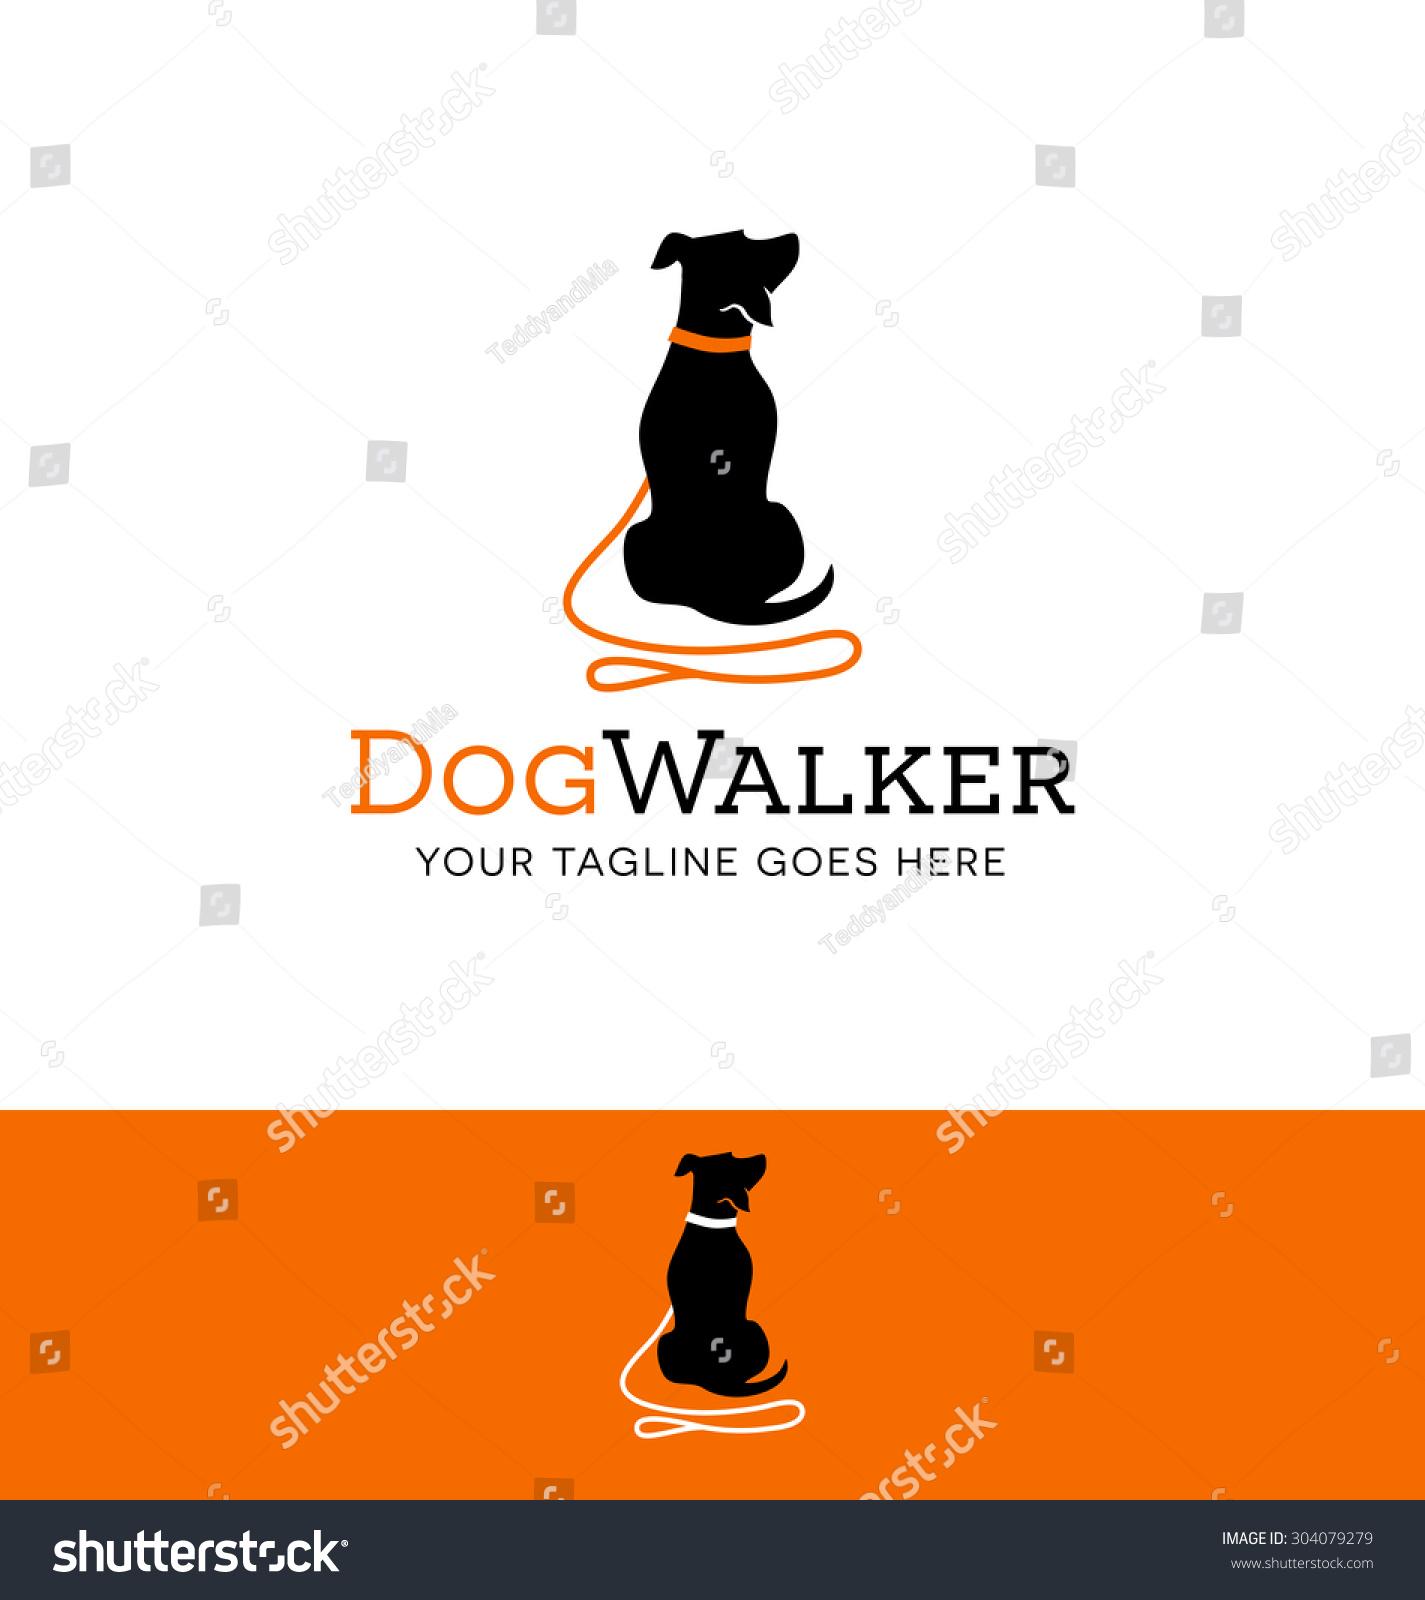 Vector graphic design business logo - Logo Design For Dog Walking Training Or Dog Related Business